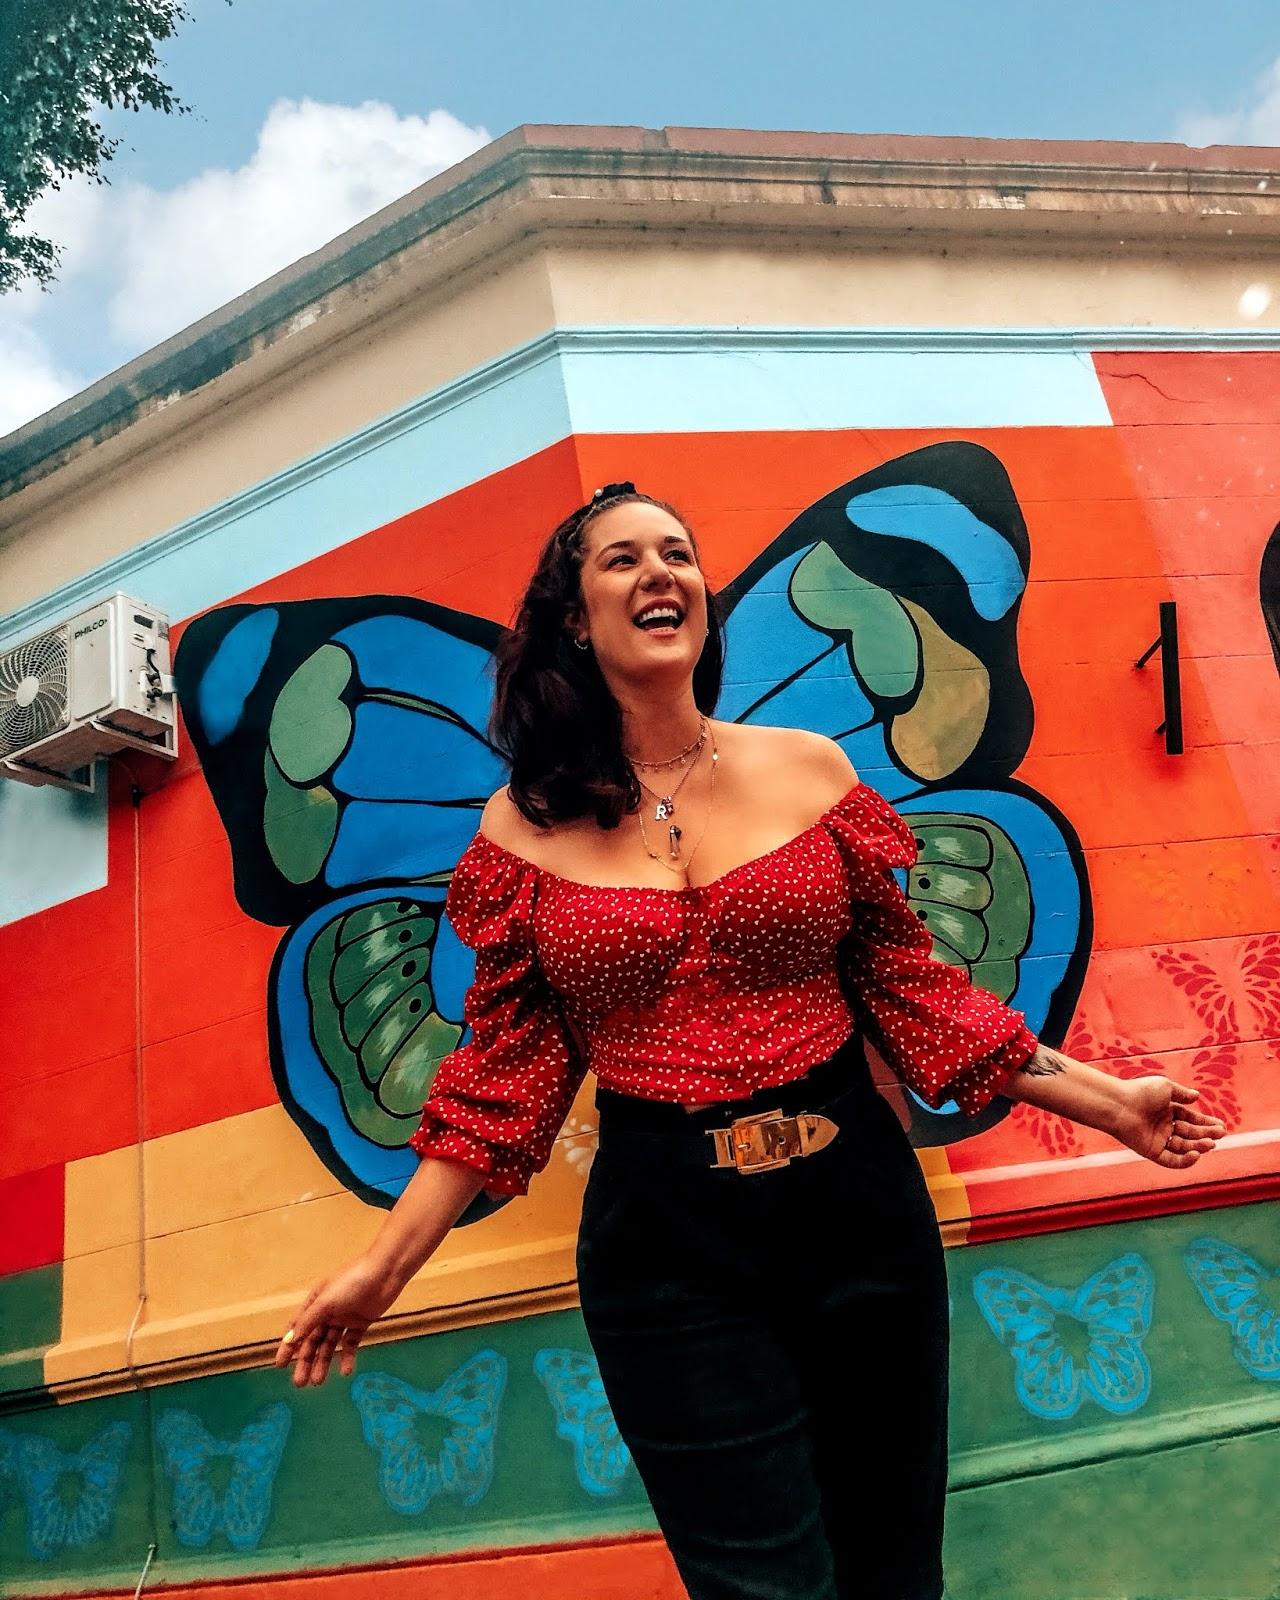 MURALES EN PALERMO - PALERMO STREET ART